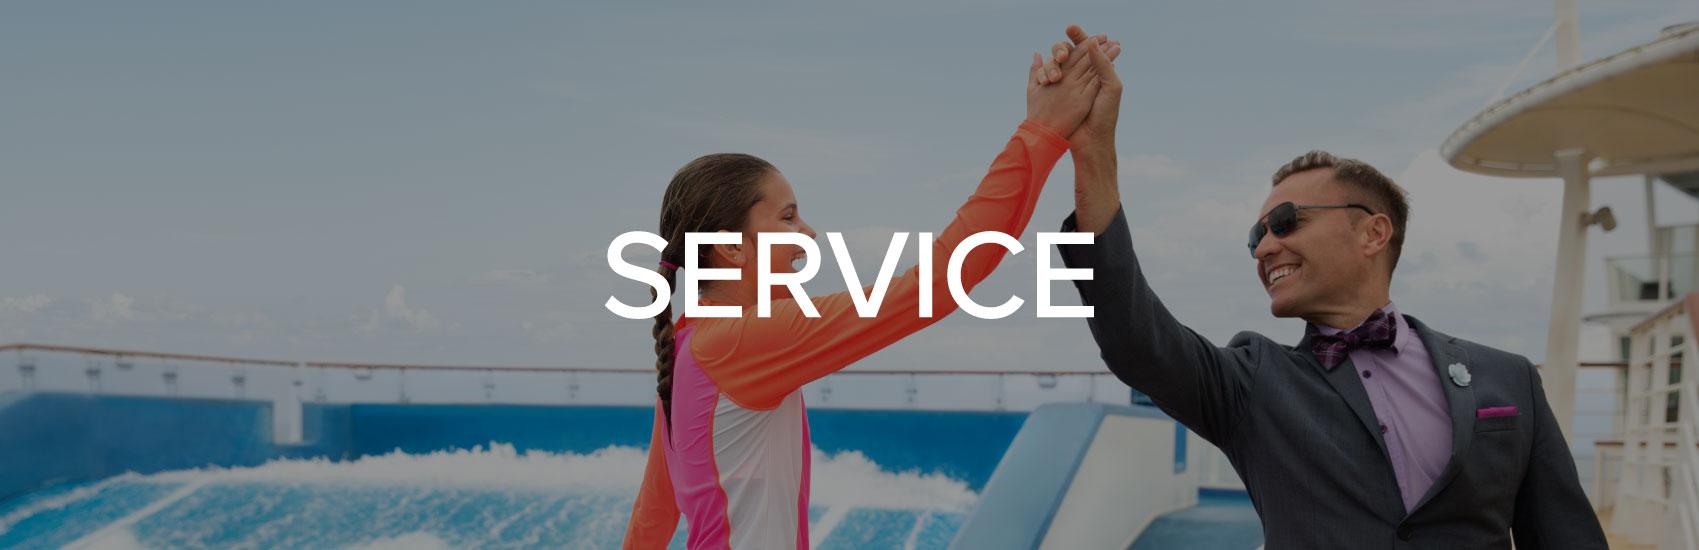 Royal Caribbean | Service 0